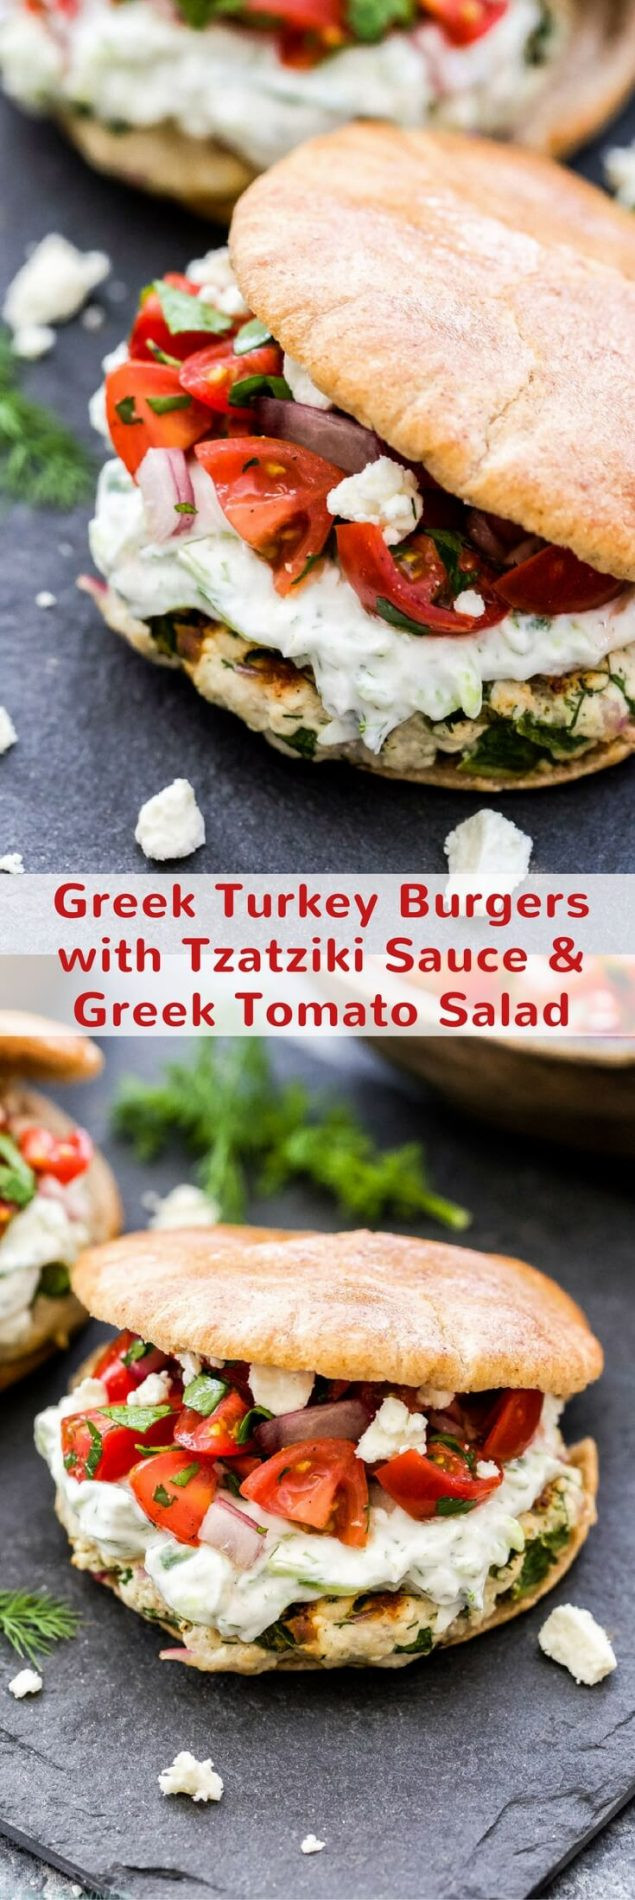 Tzatziki Sauce Kroger  Greek Turkey Burgers with Tzatziki Sauce and Greek Tomato